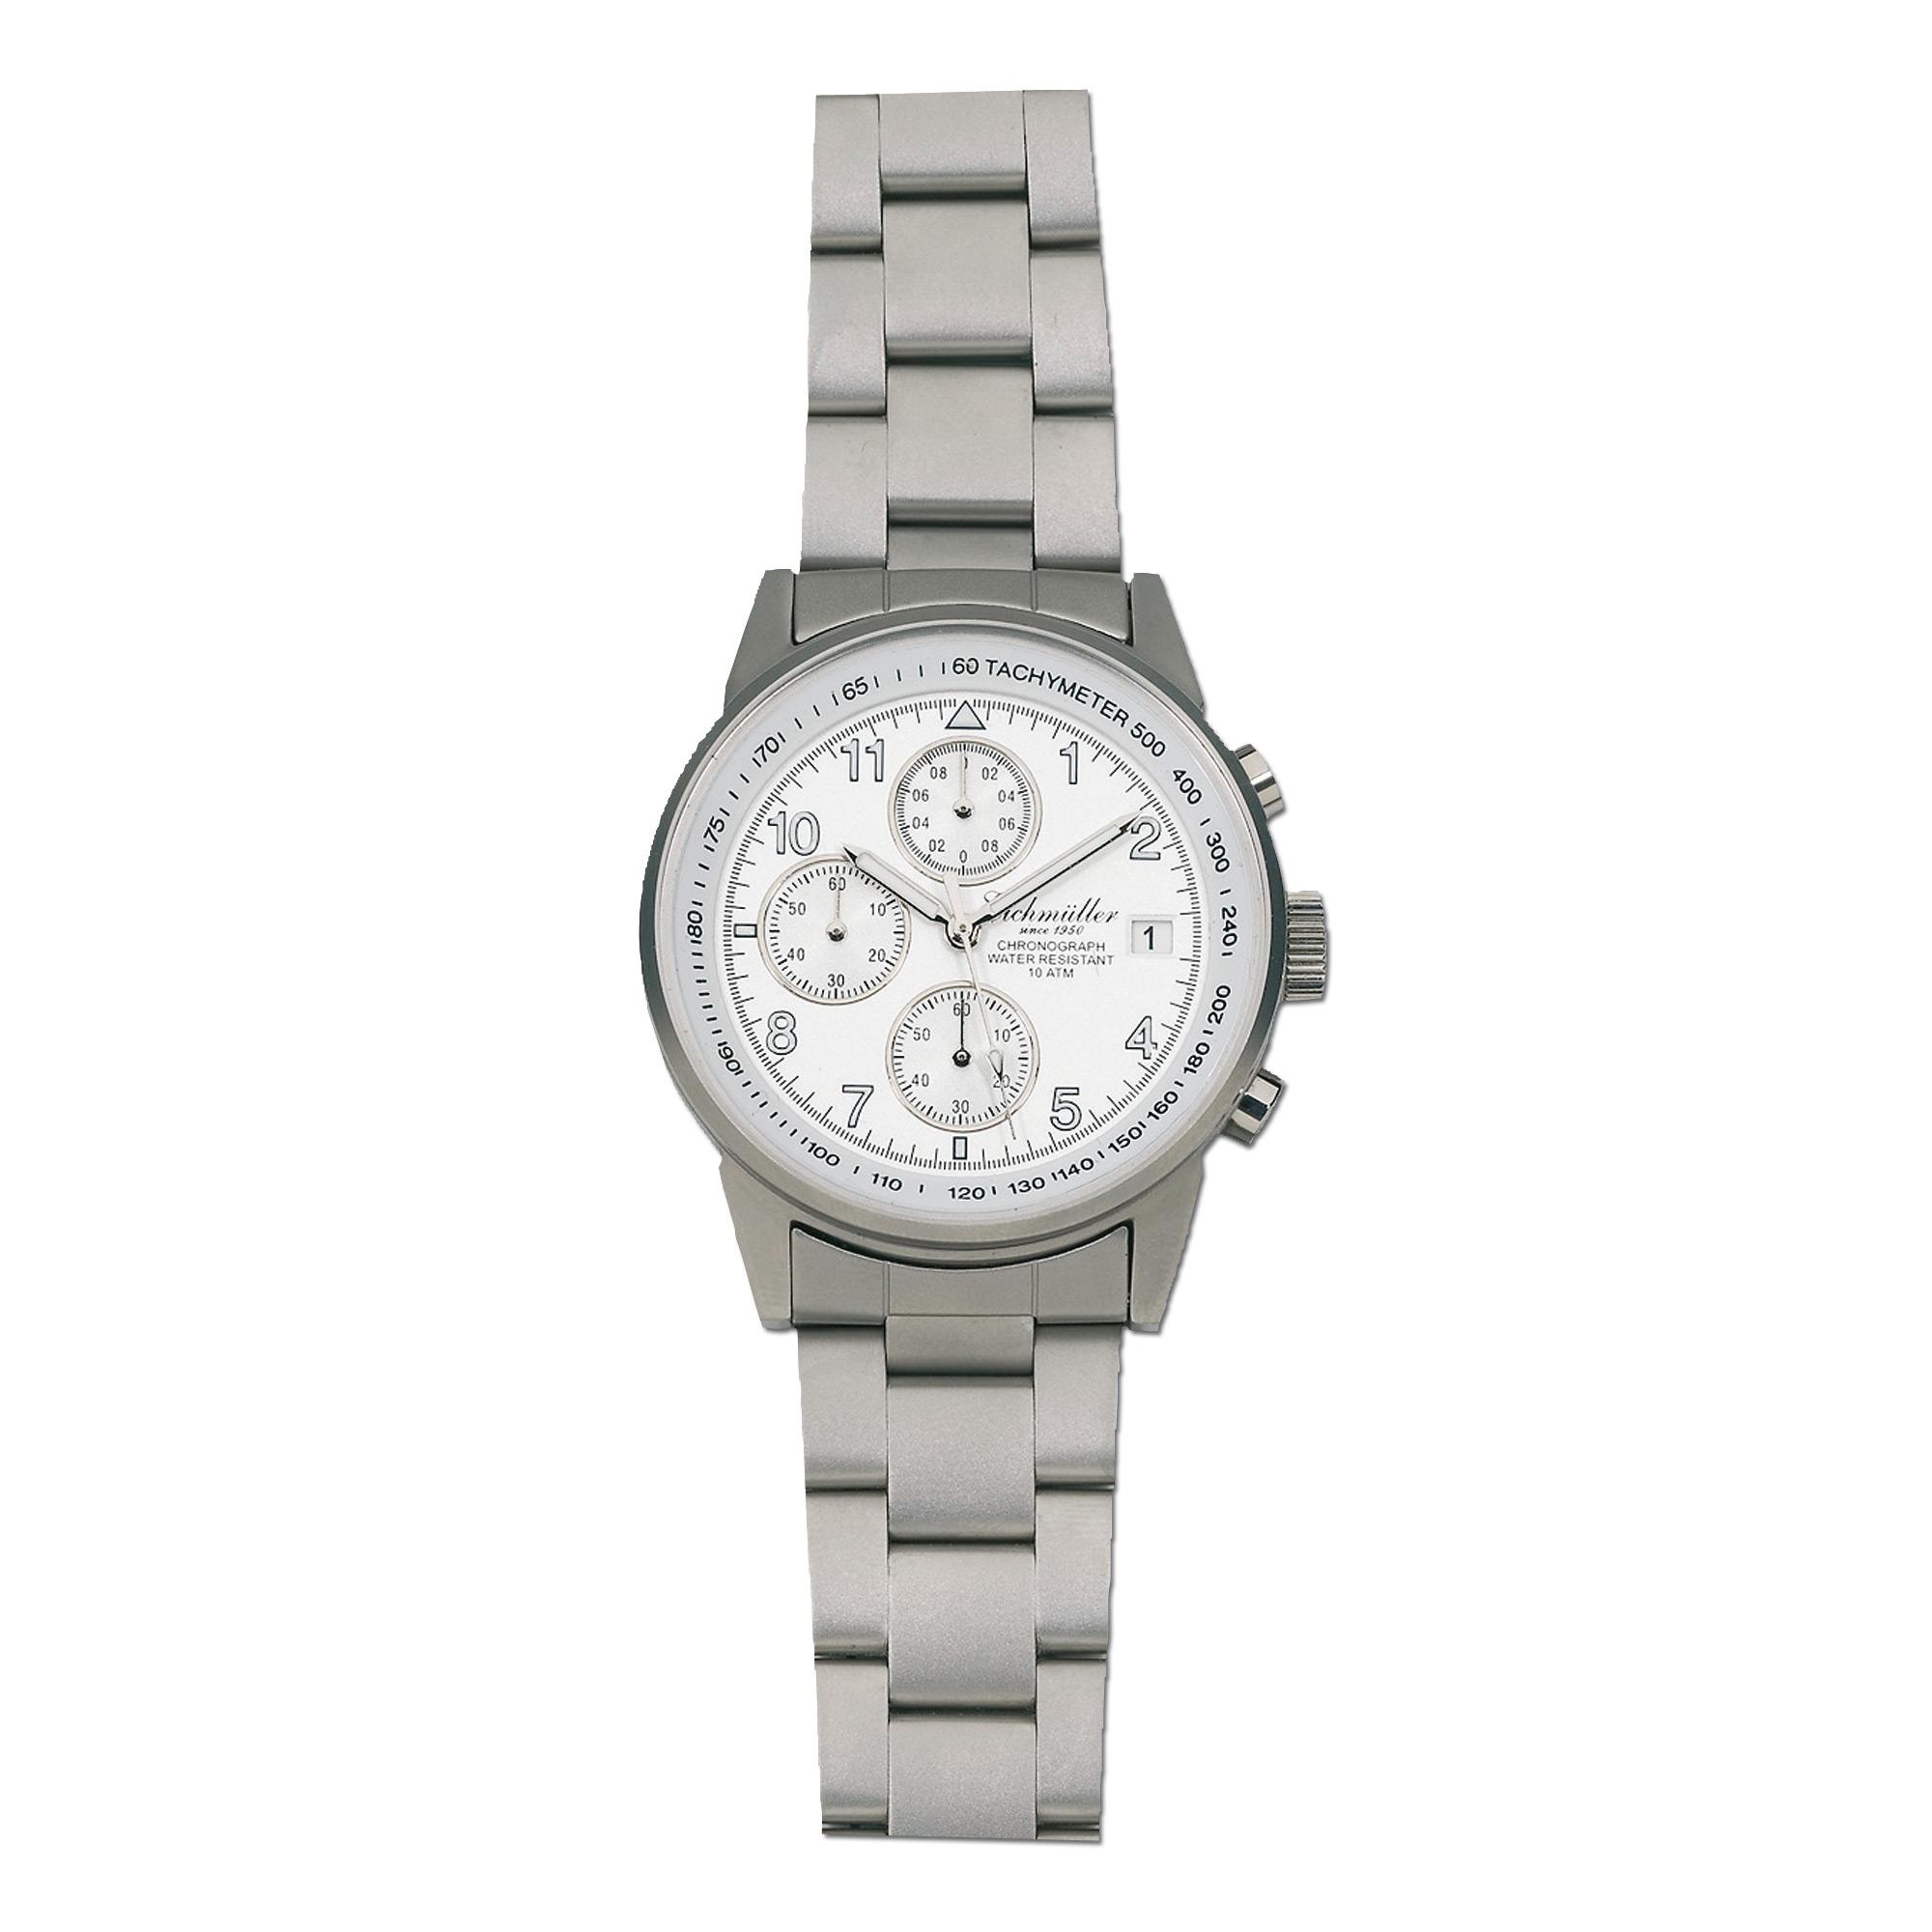 Watch Chronograph 8321/02